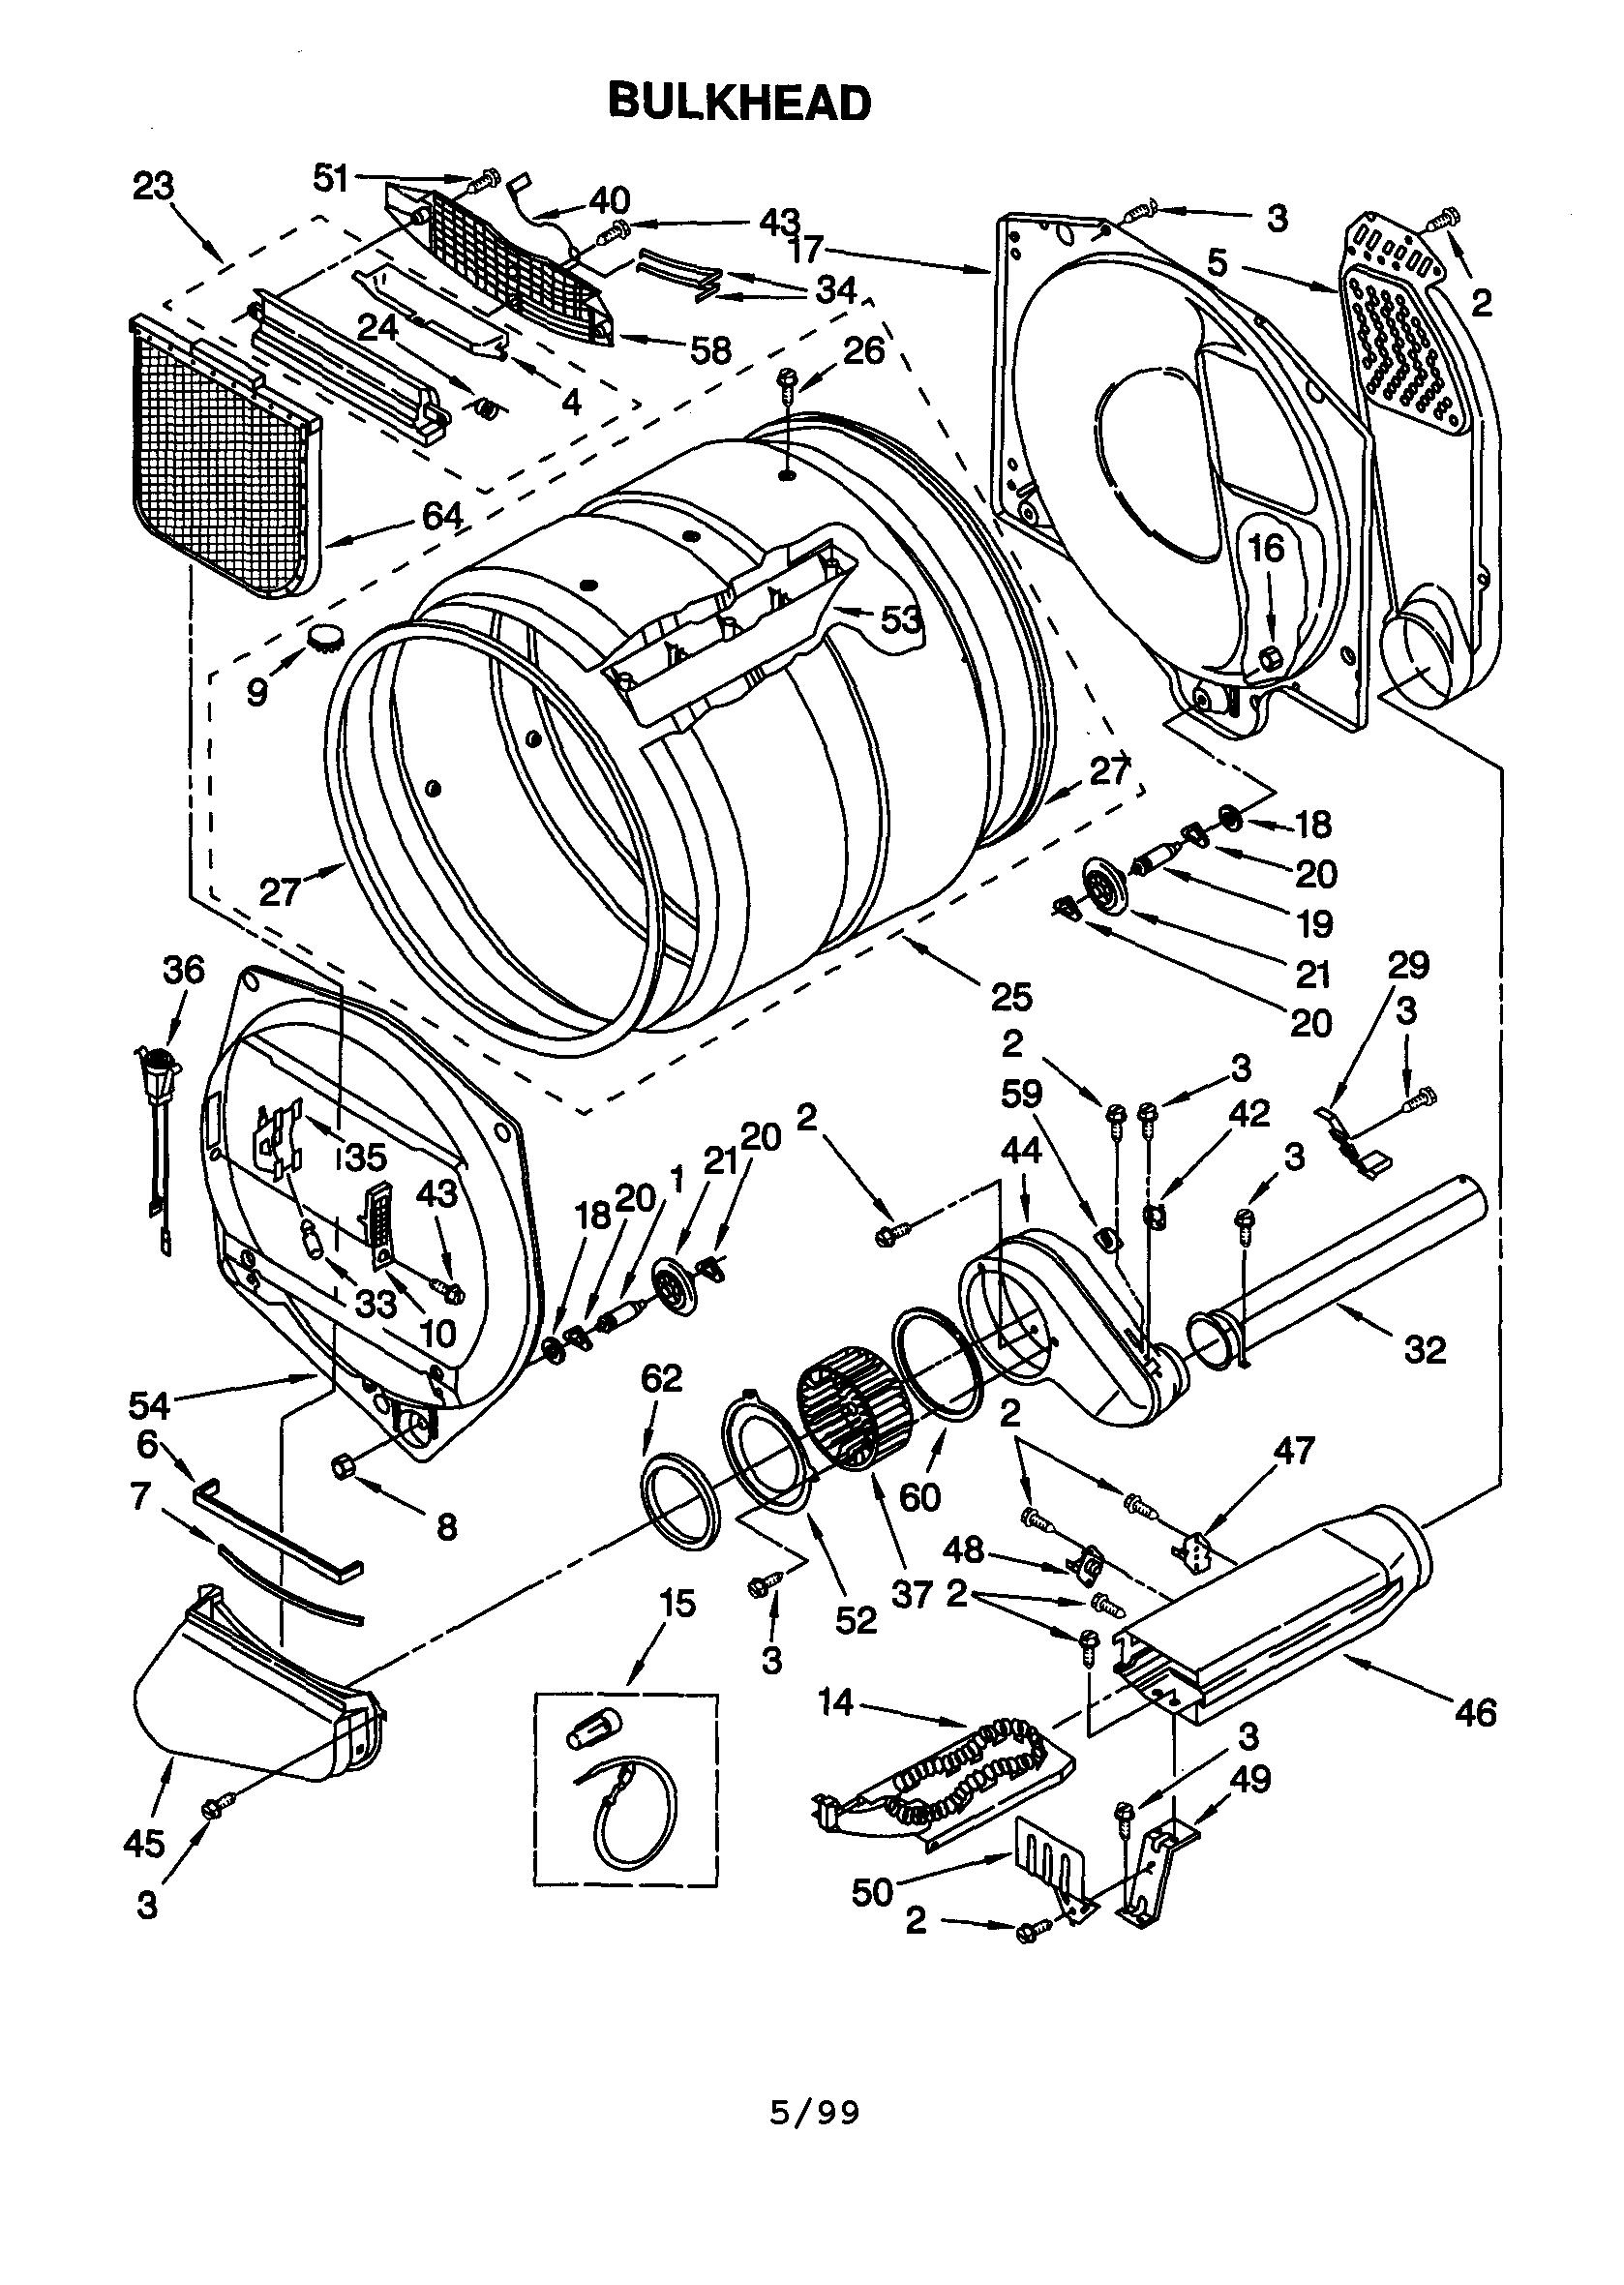 kenmore elite he5t wiring diagram tx 0299  elite dryer parts diagram furthermore kenmore gas dryer  elite dryer parts diagram furthermore